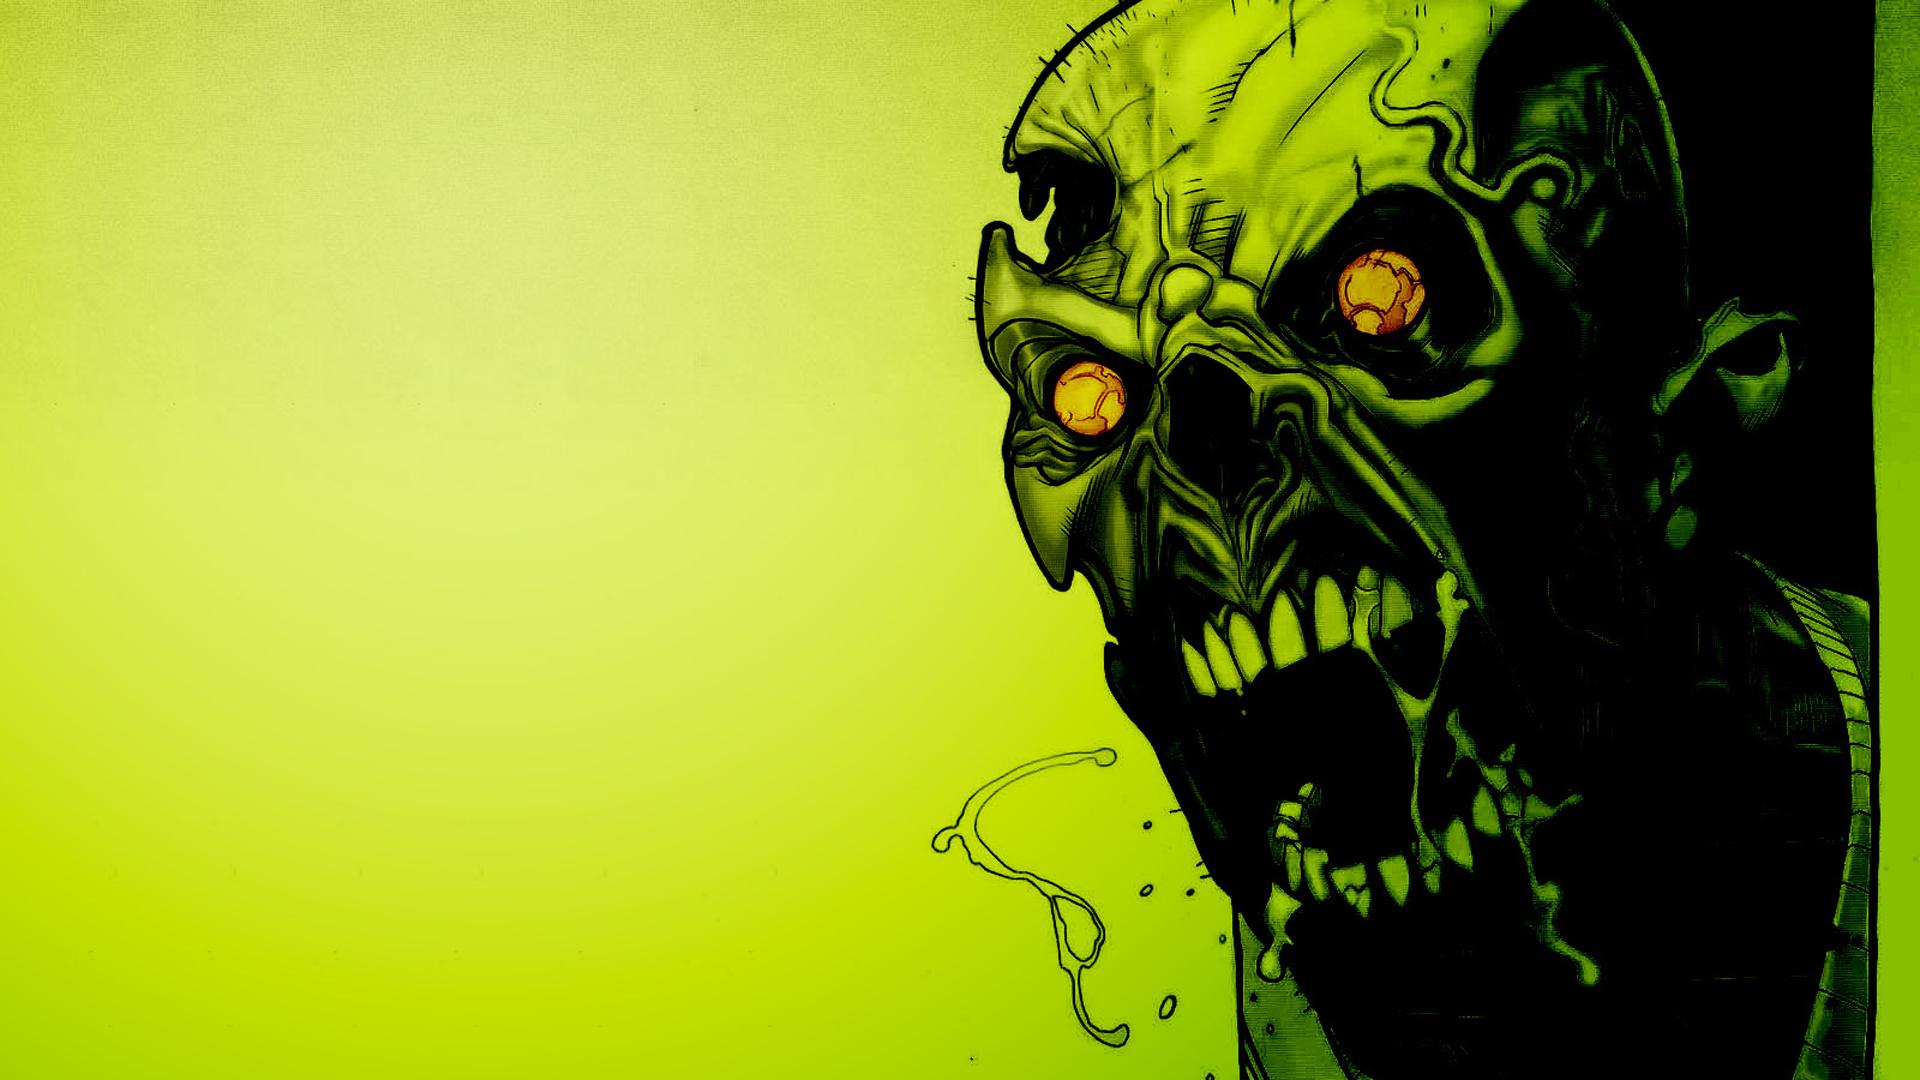 Zombies wallpaper   330646 1920x1080